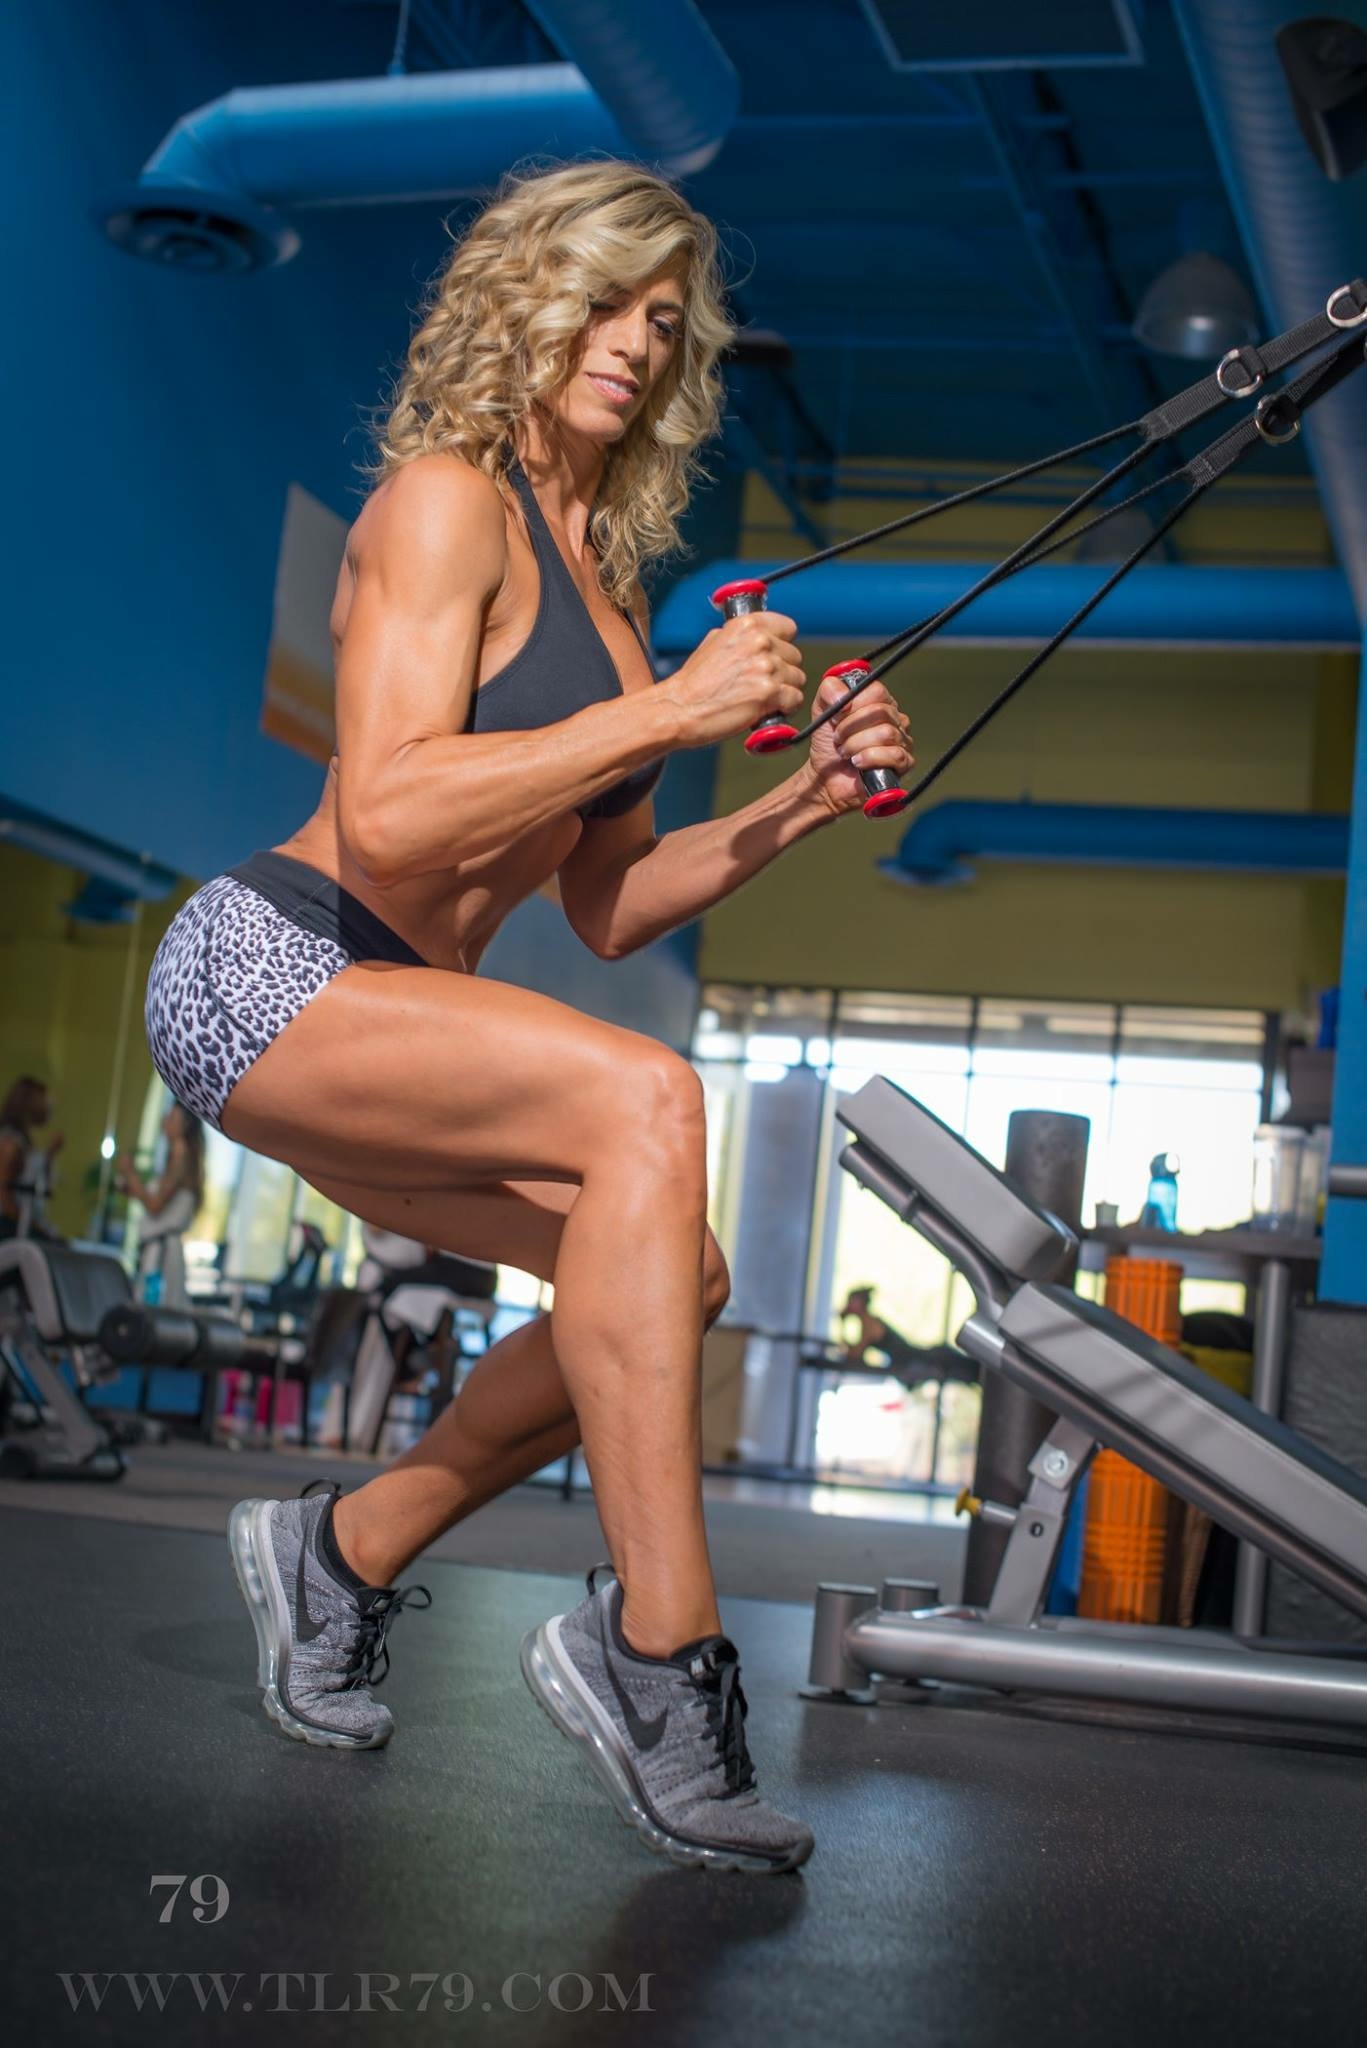 www fitness com